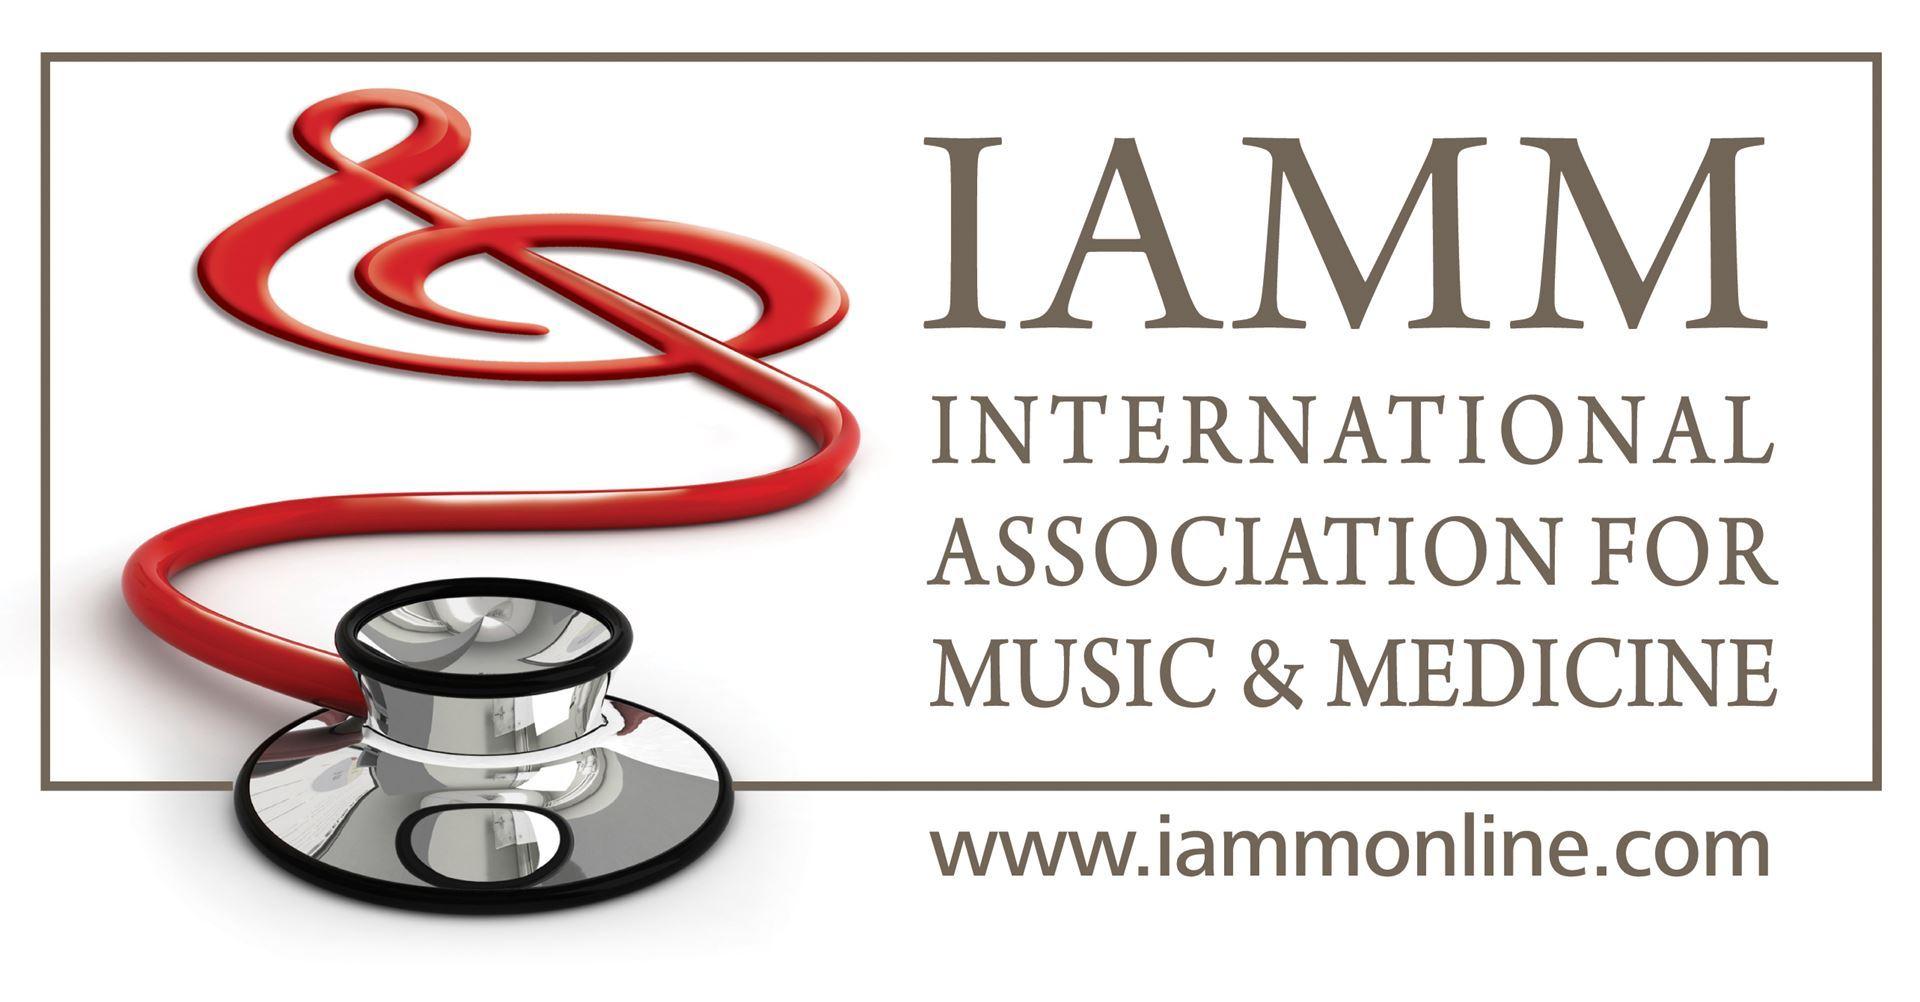 International Association for Music & Medicine